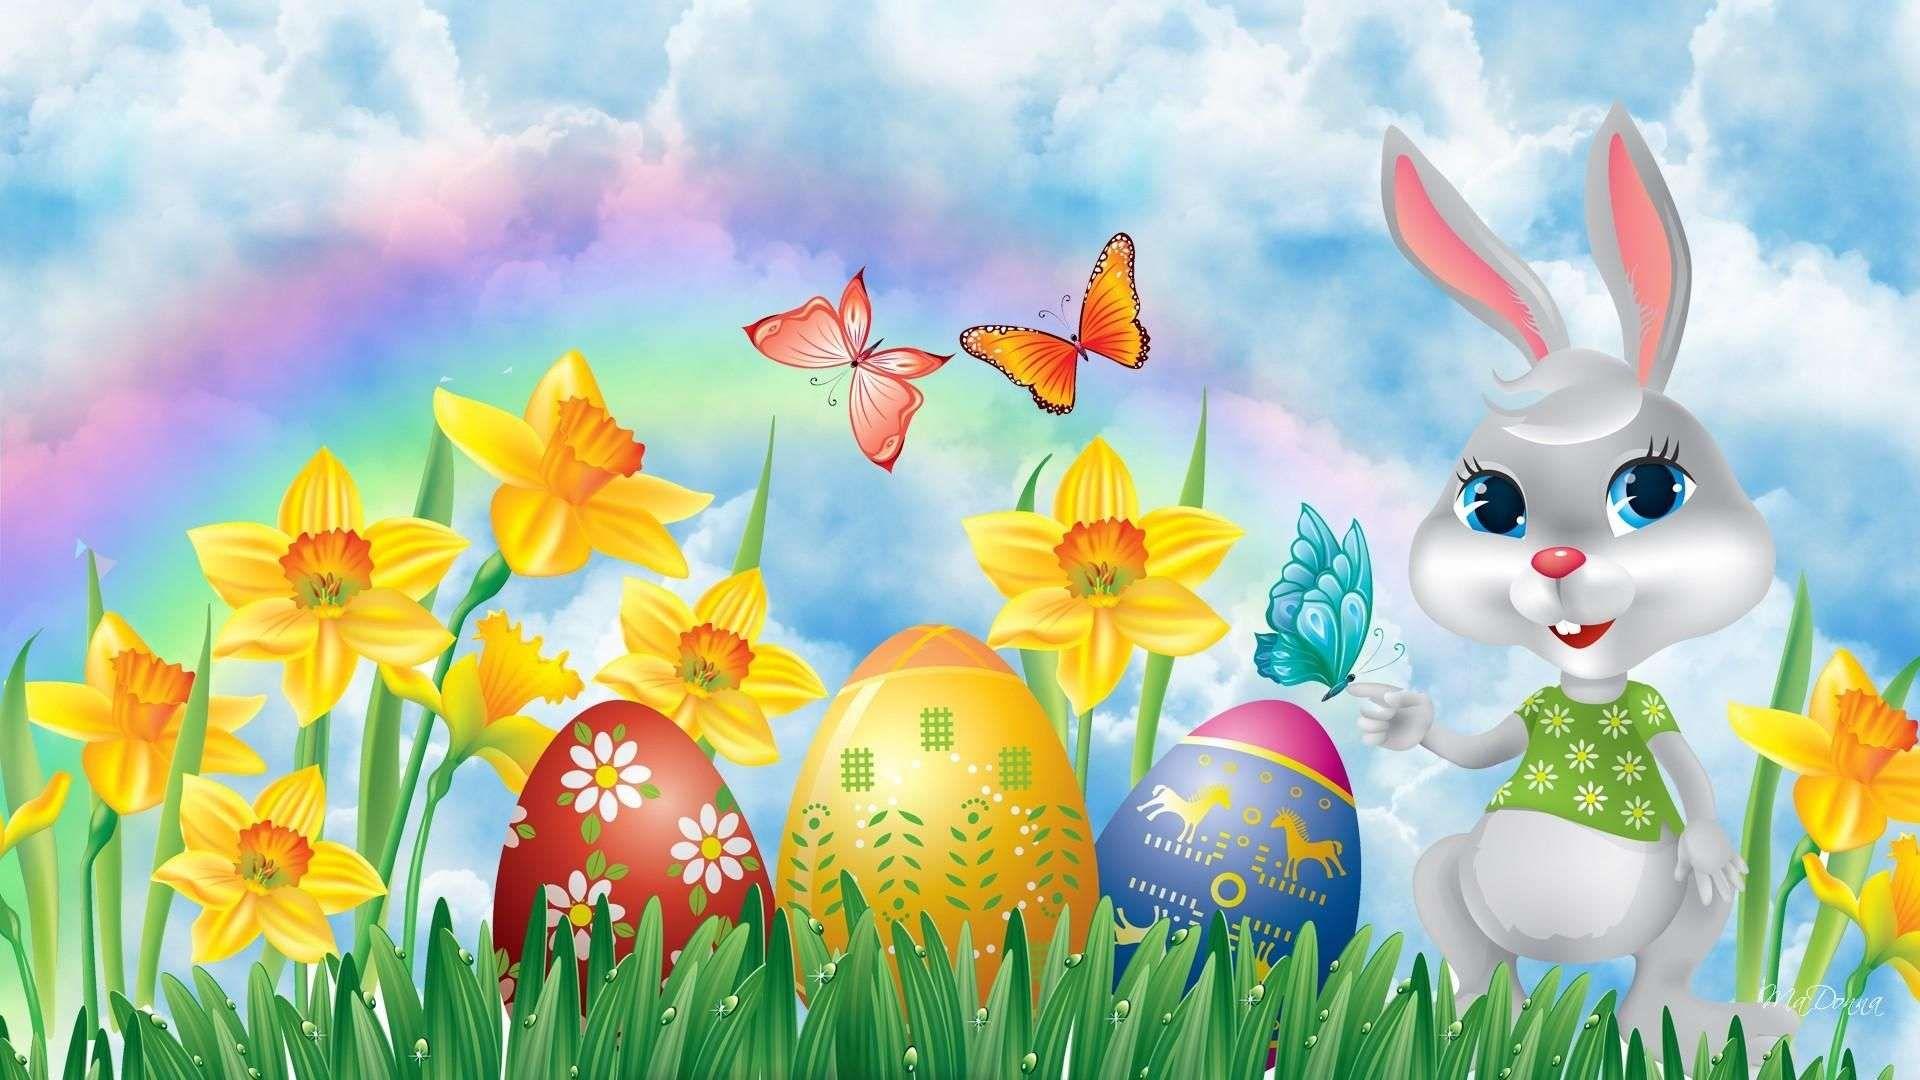 Happy Easter Wallpaper Easter Wallpaper Happy Easter Wallpaper